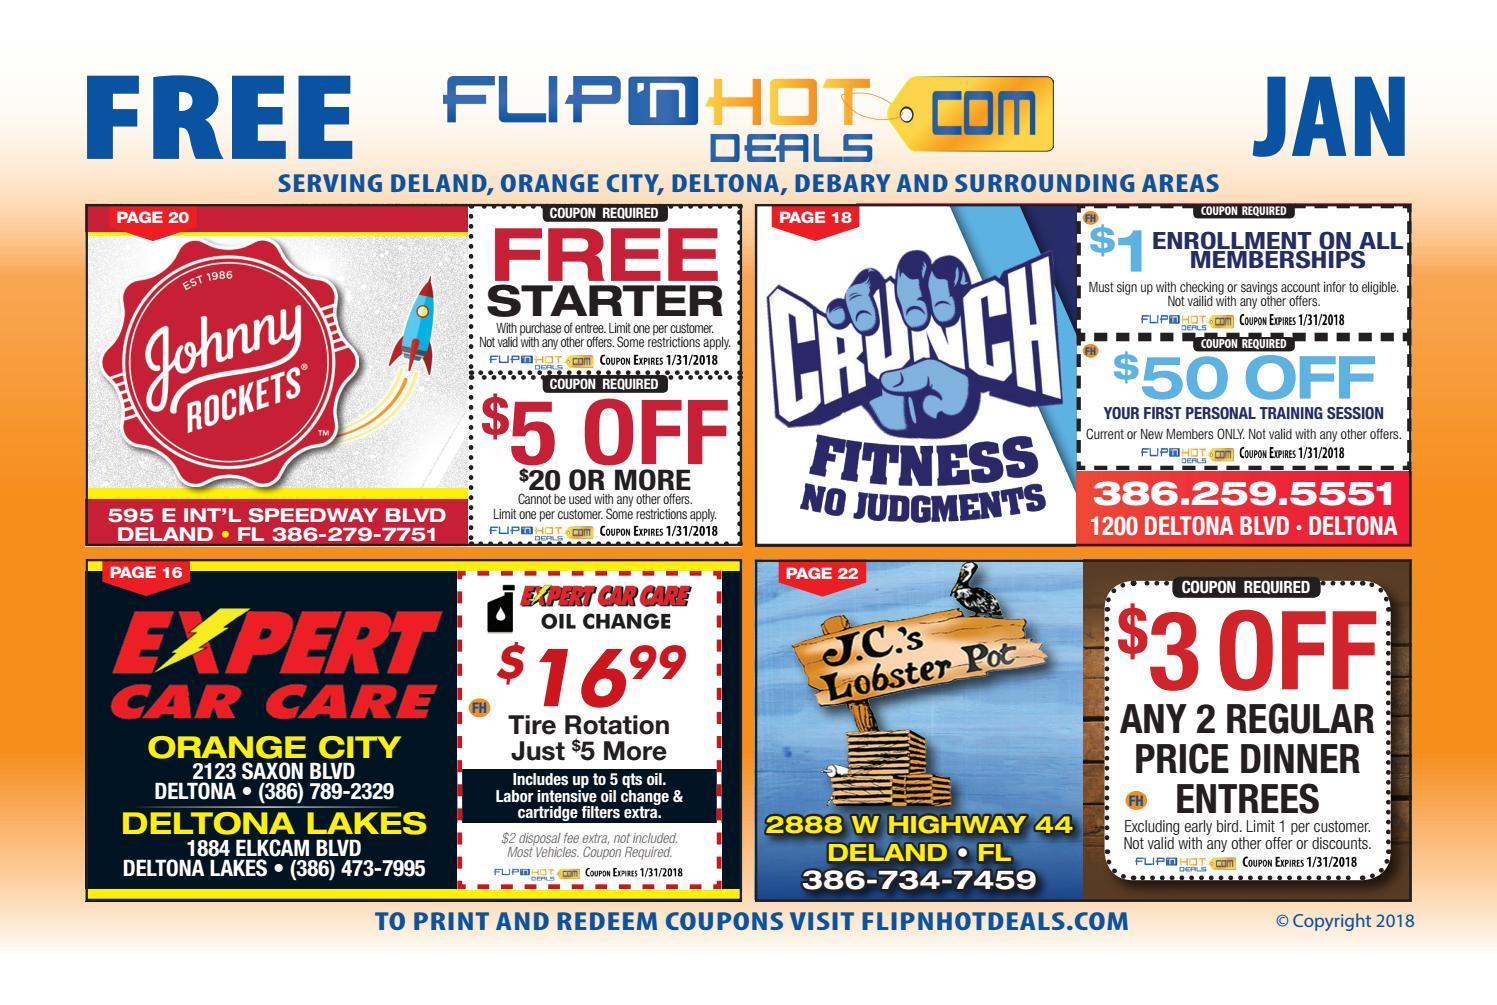 flip'nhot deals coupon book deland january 2018 - deland